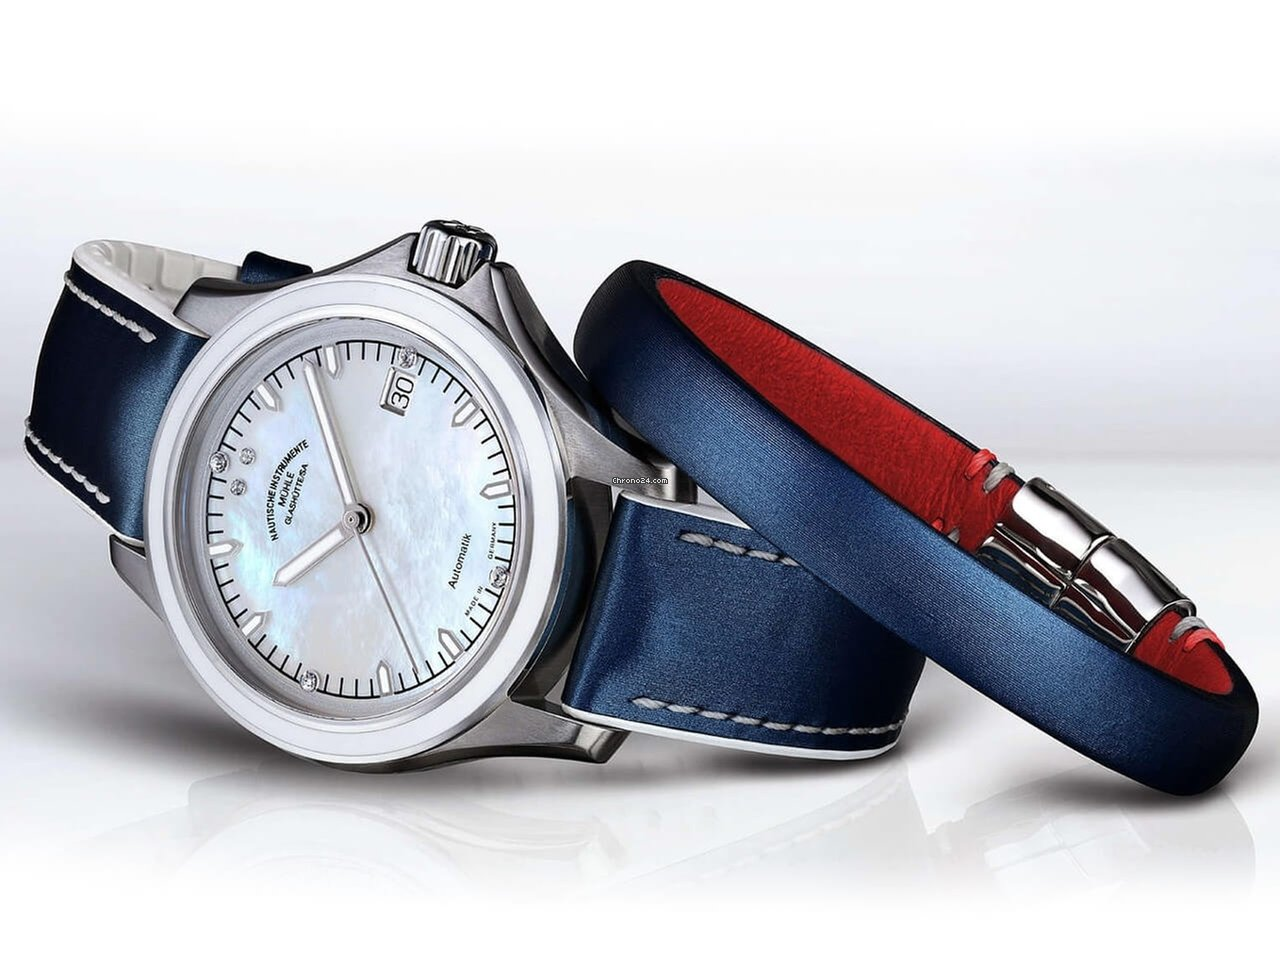 Datum Lederband Blau Mühle Helgacup Lady Promare Weiß Glashütte Sonderedition Damenuhr Rot FKJl1Tuc35